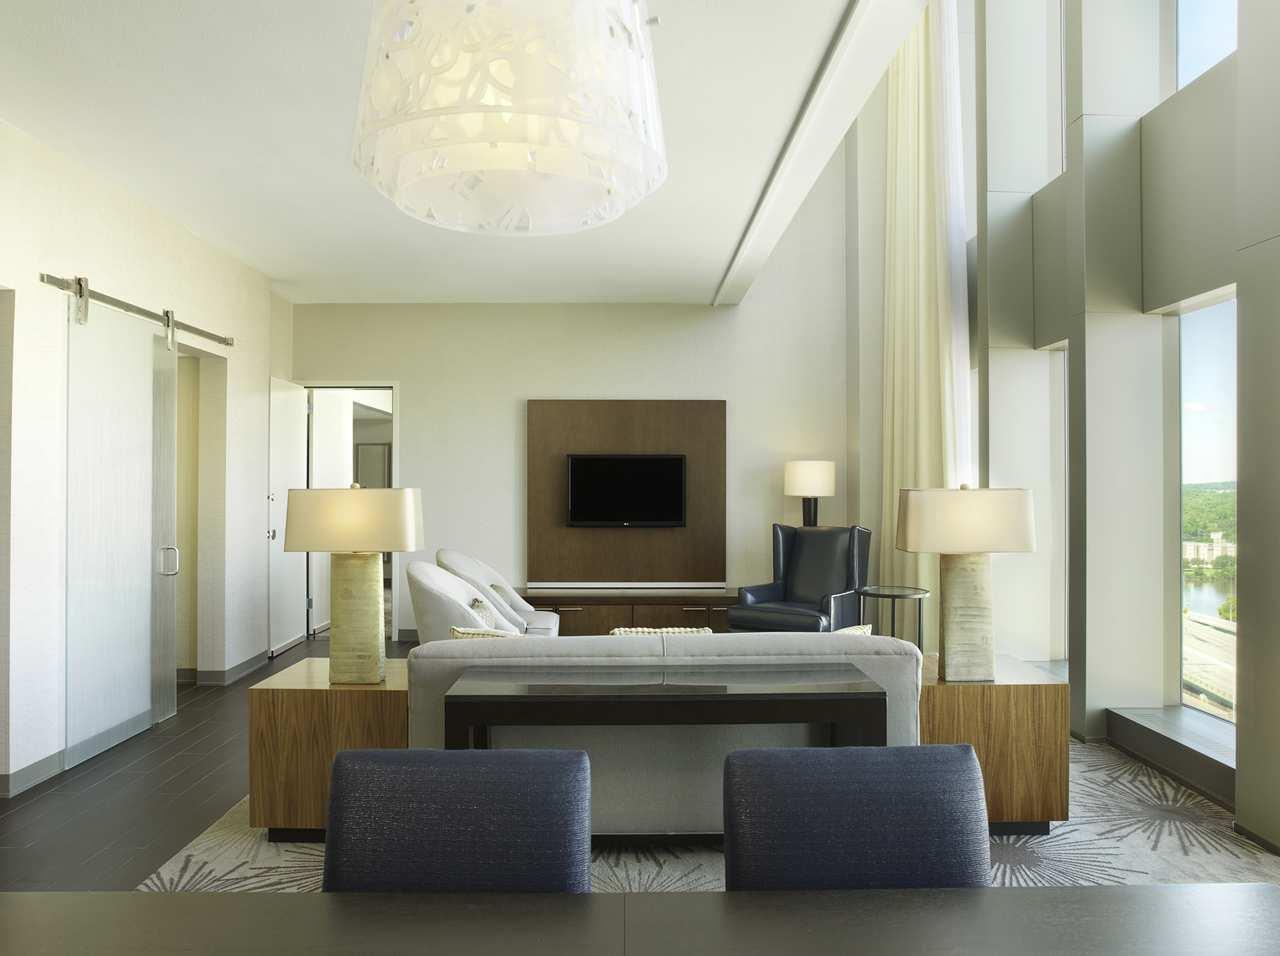 DoubleTree by Hilton Hotel Cedar Rapids Convention Complex image 18